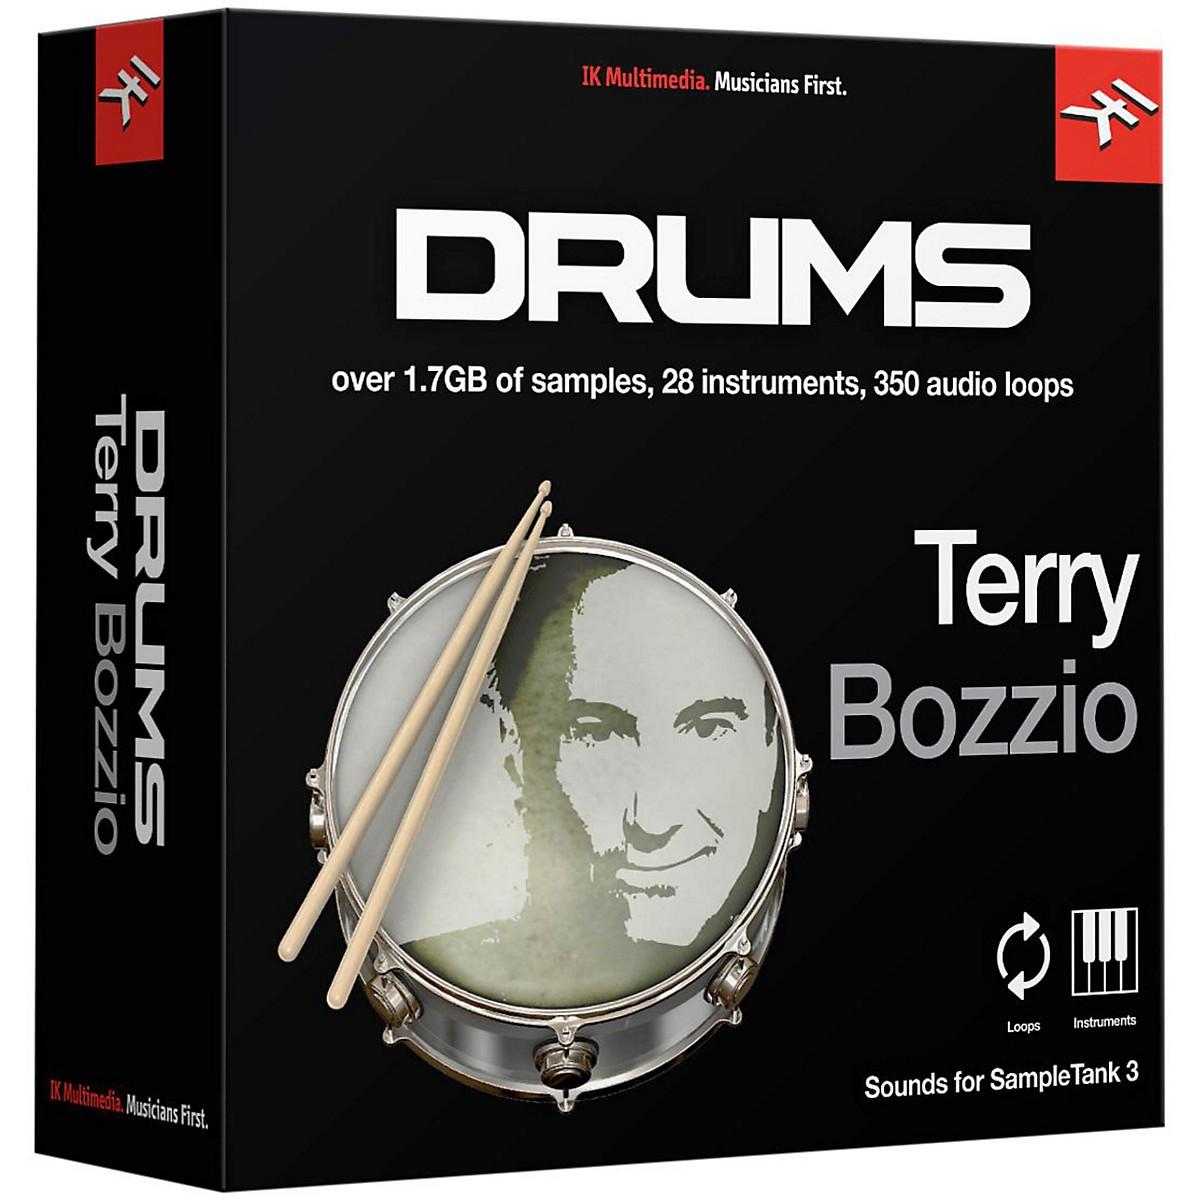 IK Multimedia SampleTank 3 Instrument Collection - Terry Bozzio Drums